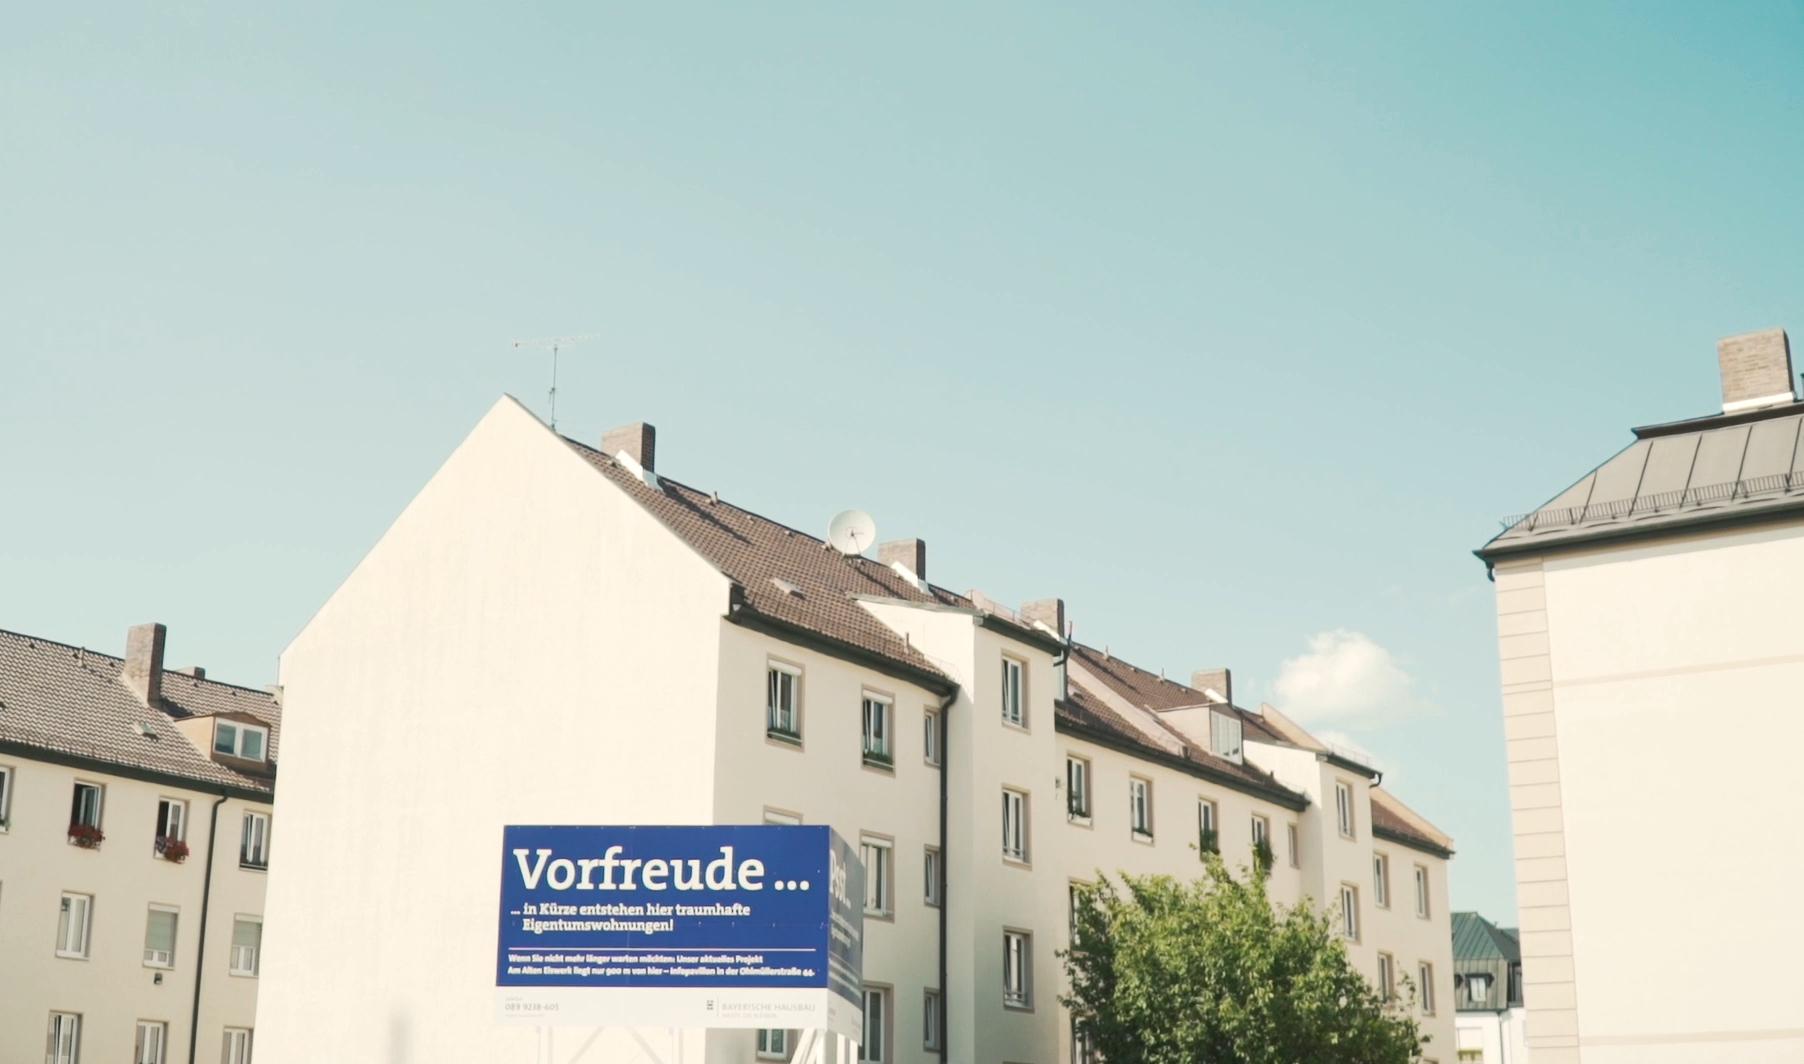 Stadtspaziergang: Luxuswohnung vs. bezahlbarer Wohnraum in Au ...